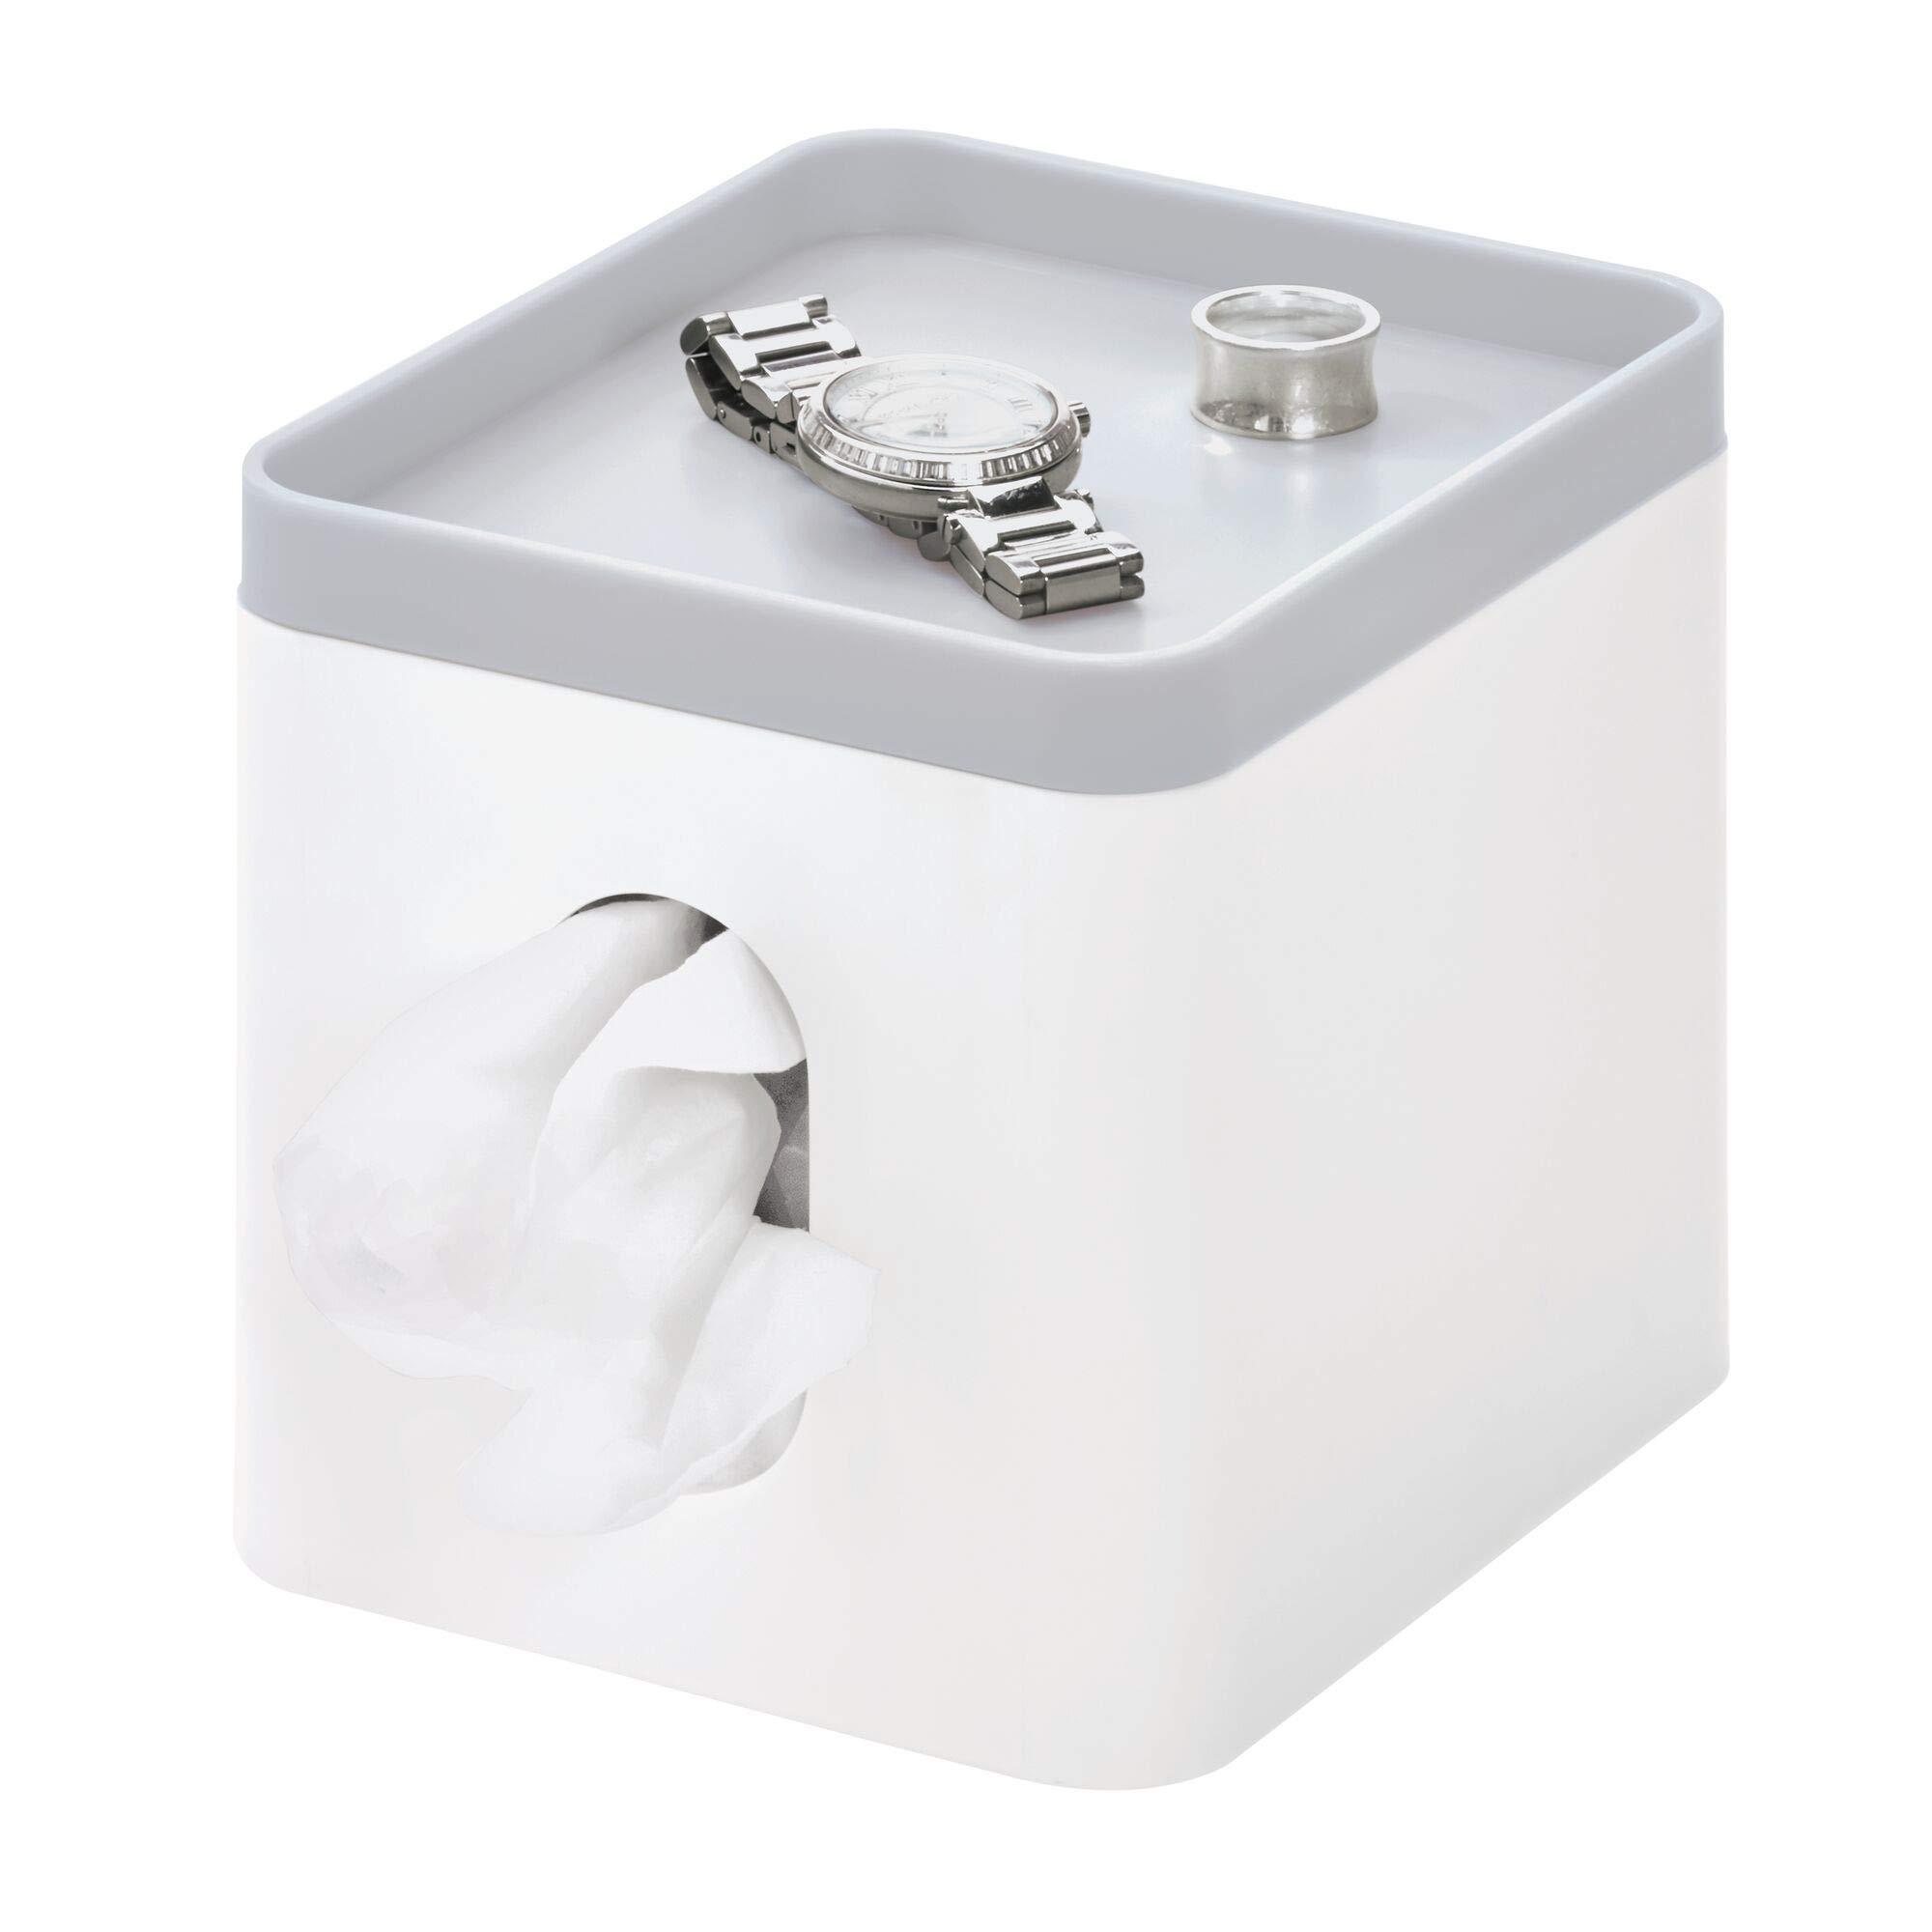 iDesign Cade Facial Tissue Cover, Boutique Box Bathroom Holder for Vanity, Countertops, Desk, Office, Dorm-Matte White/Gray